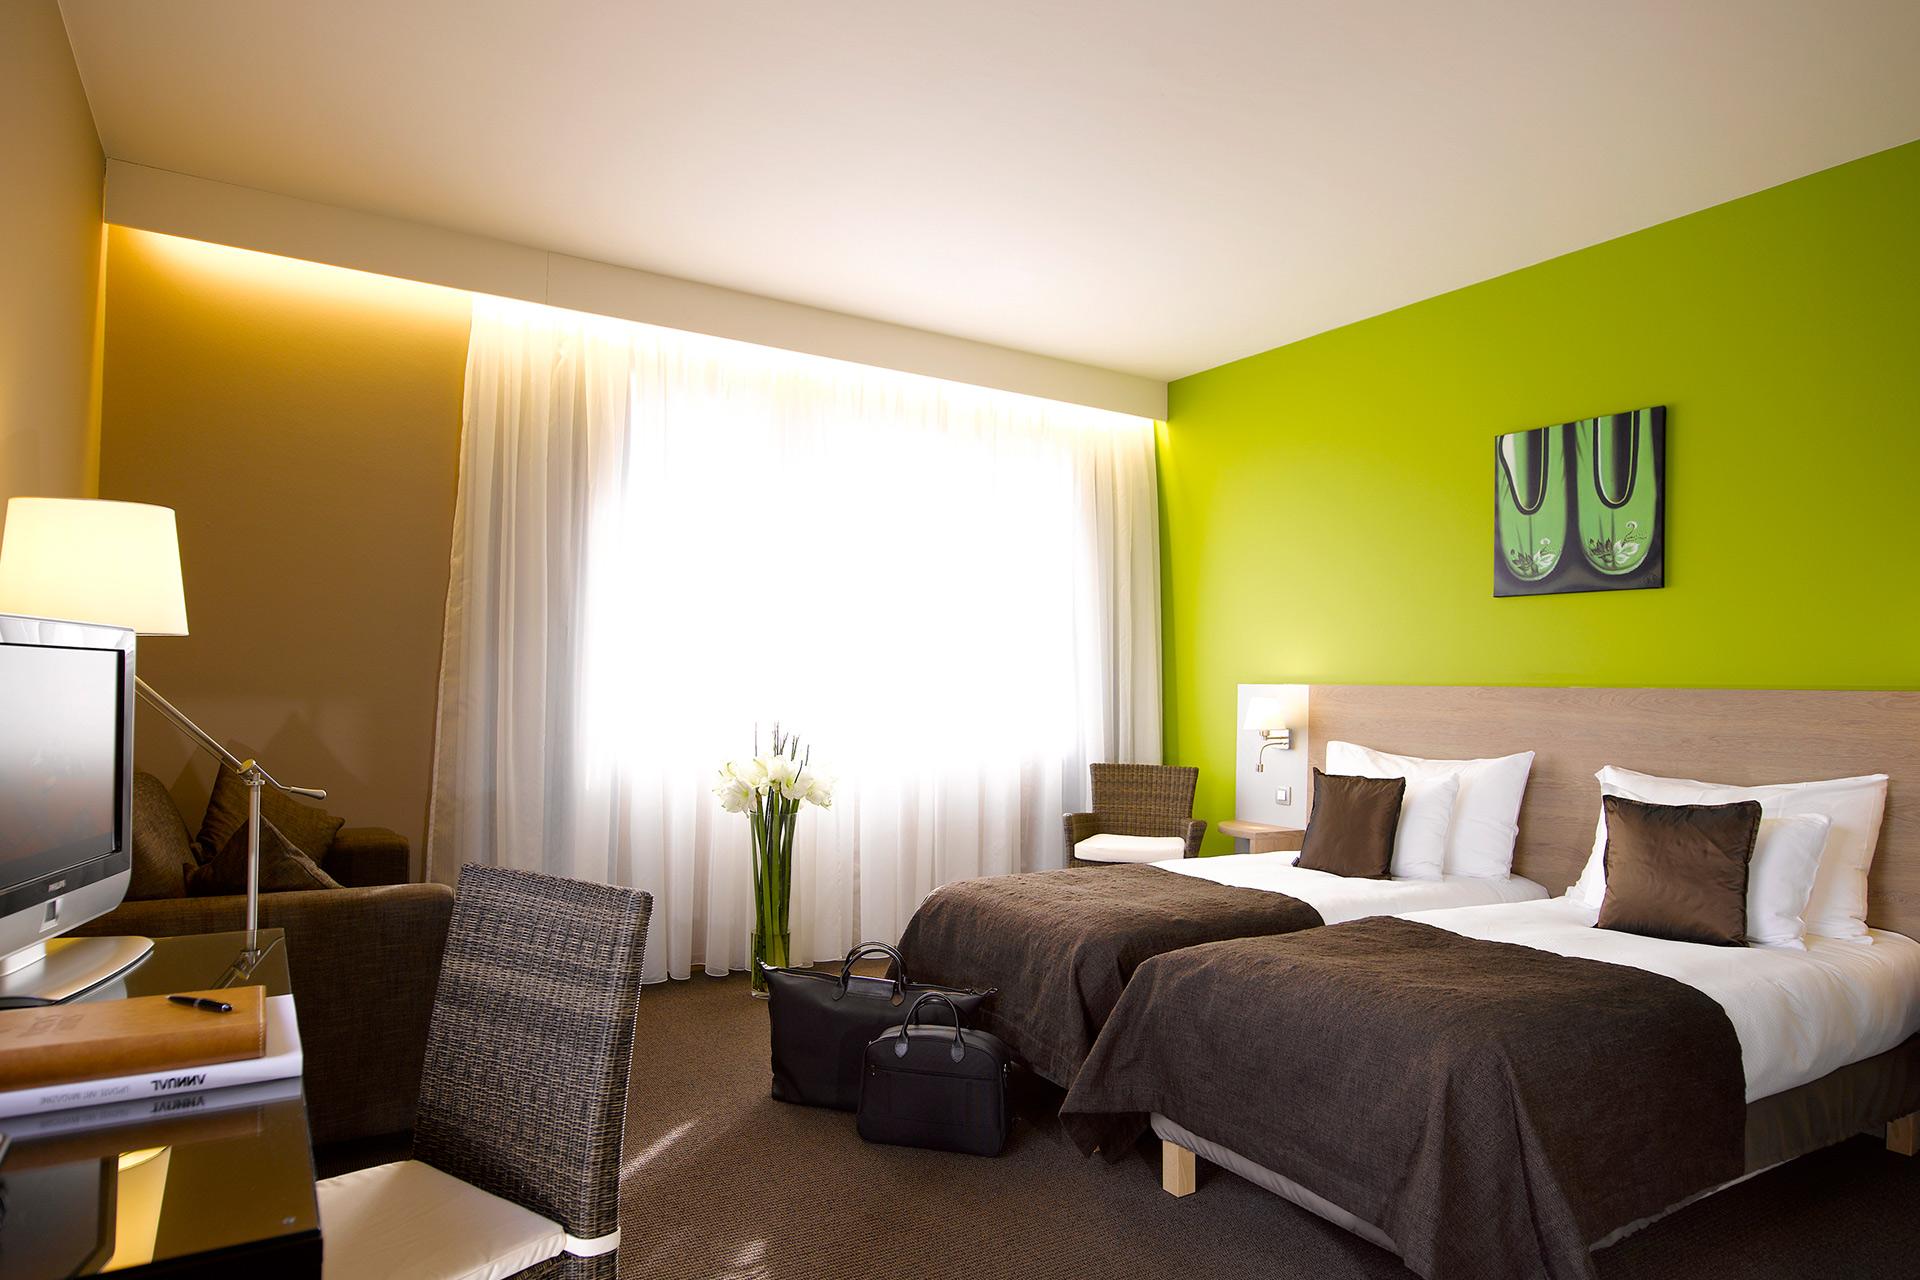 Golfexpedition-Golfreizen-België-Brussel-Waterloo-course-slaapkamer-groen